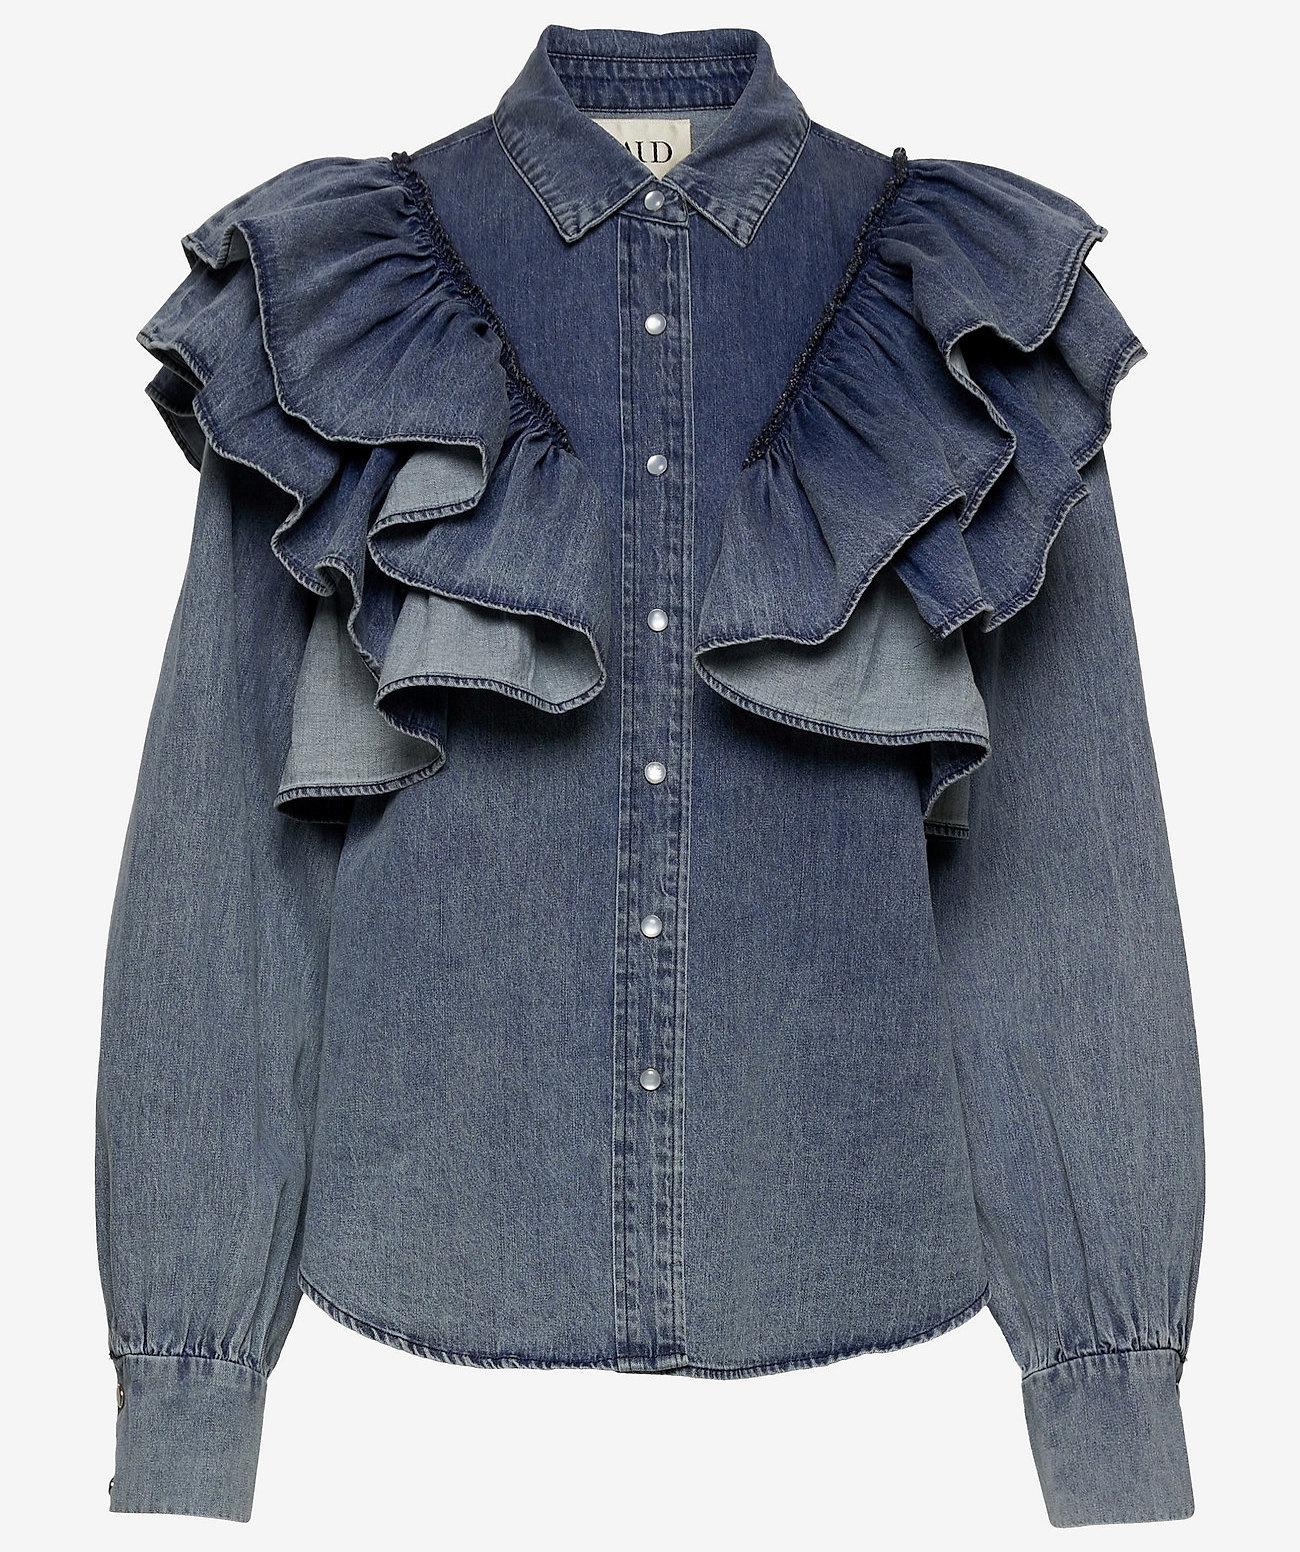 MAUD Dames blouse, blauw